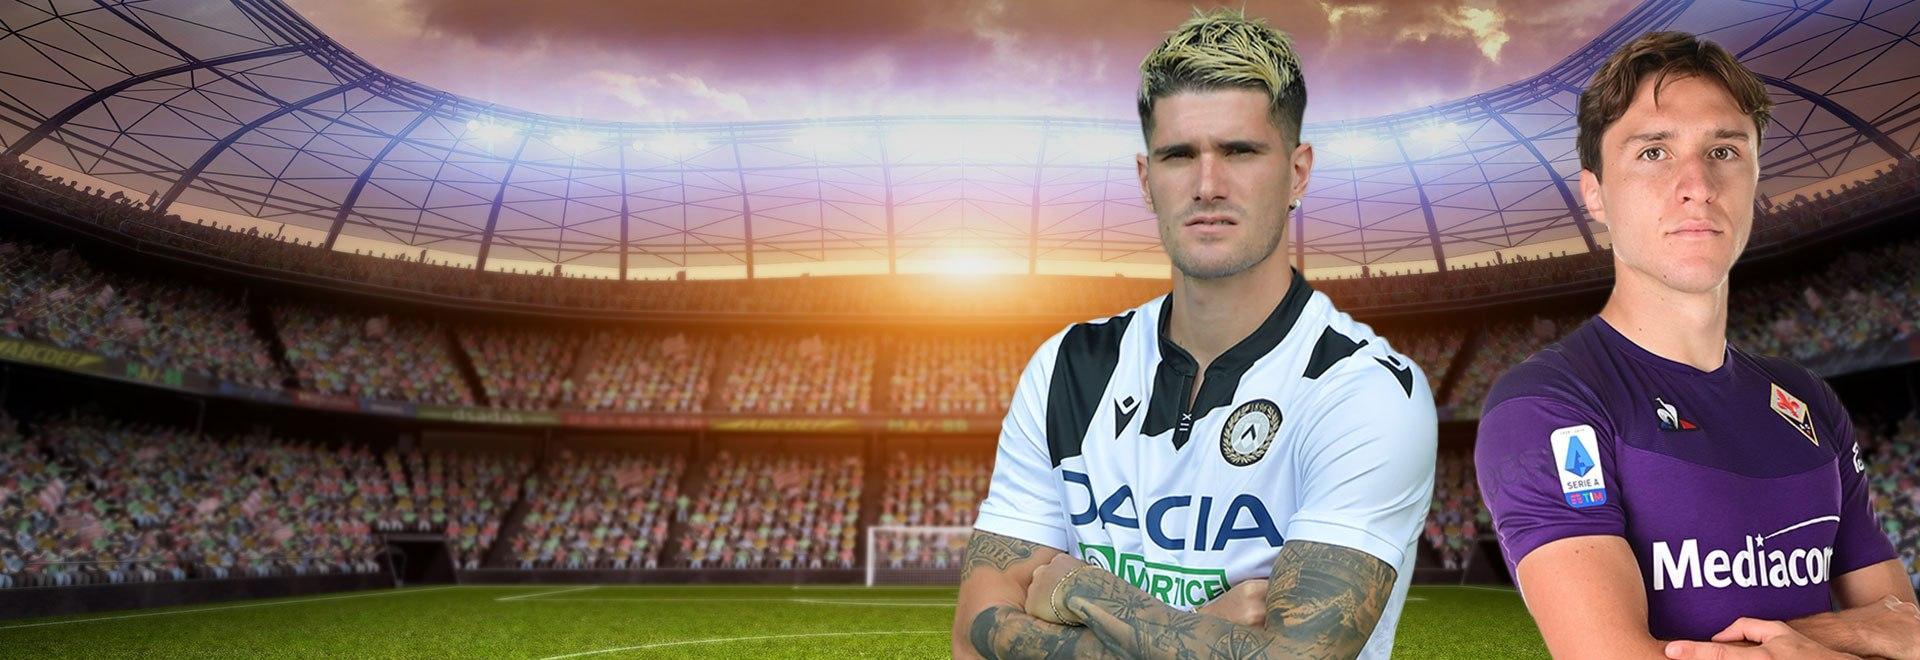 Udinese - Fiorentina. 26a g.